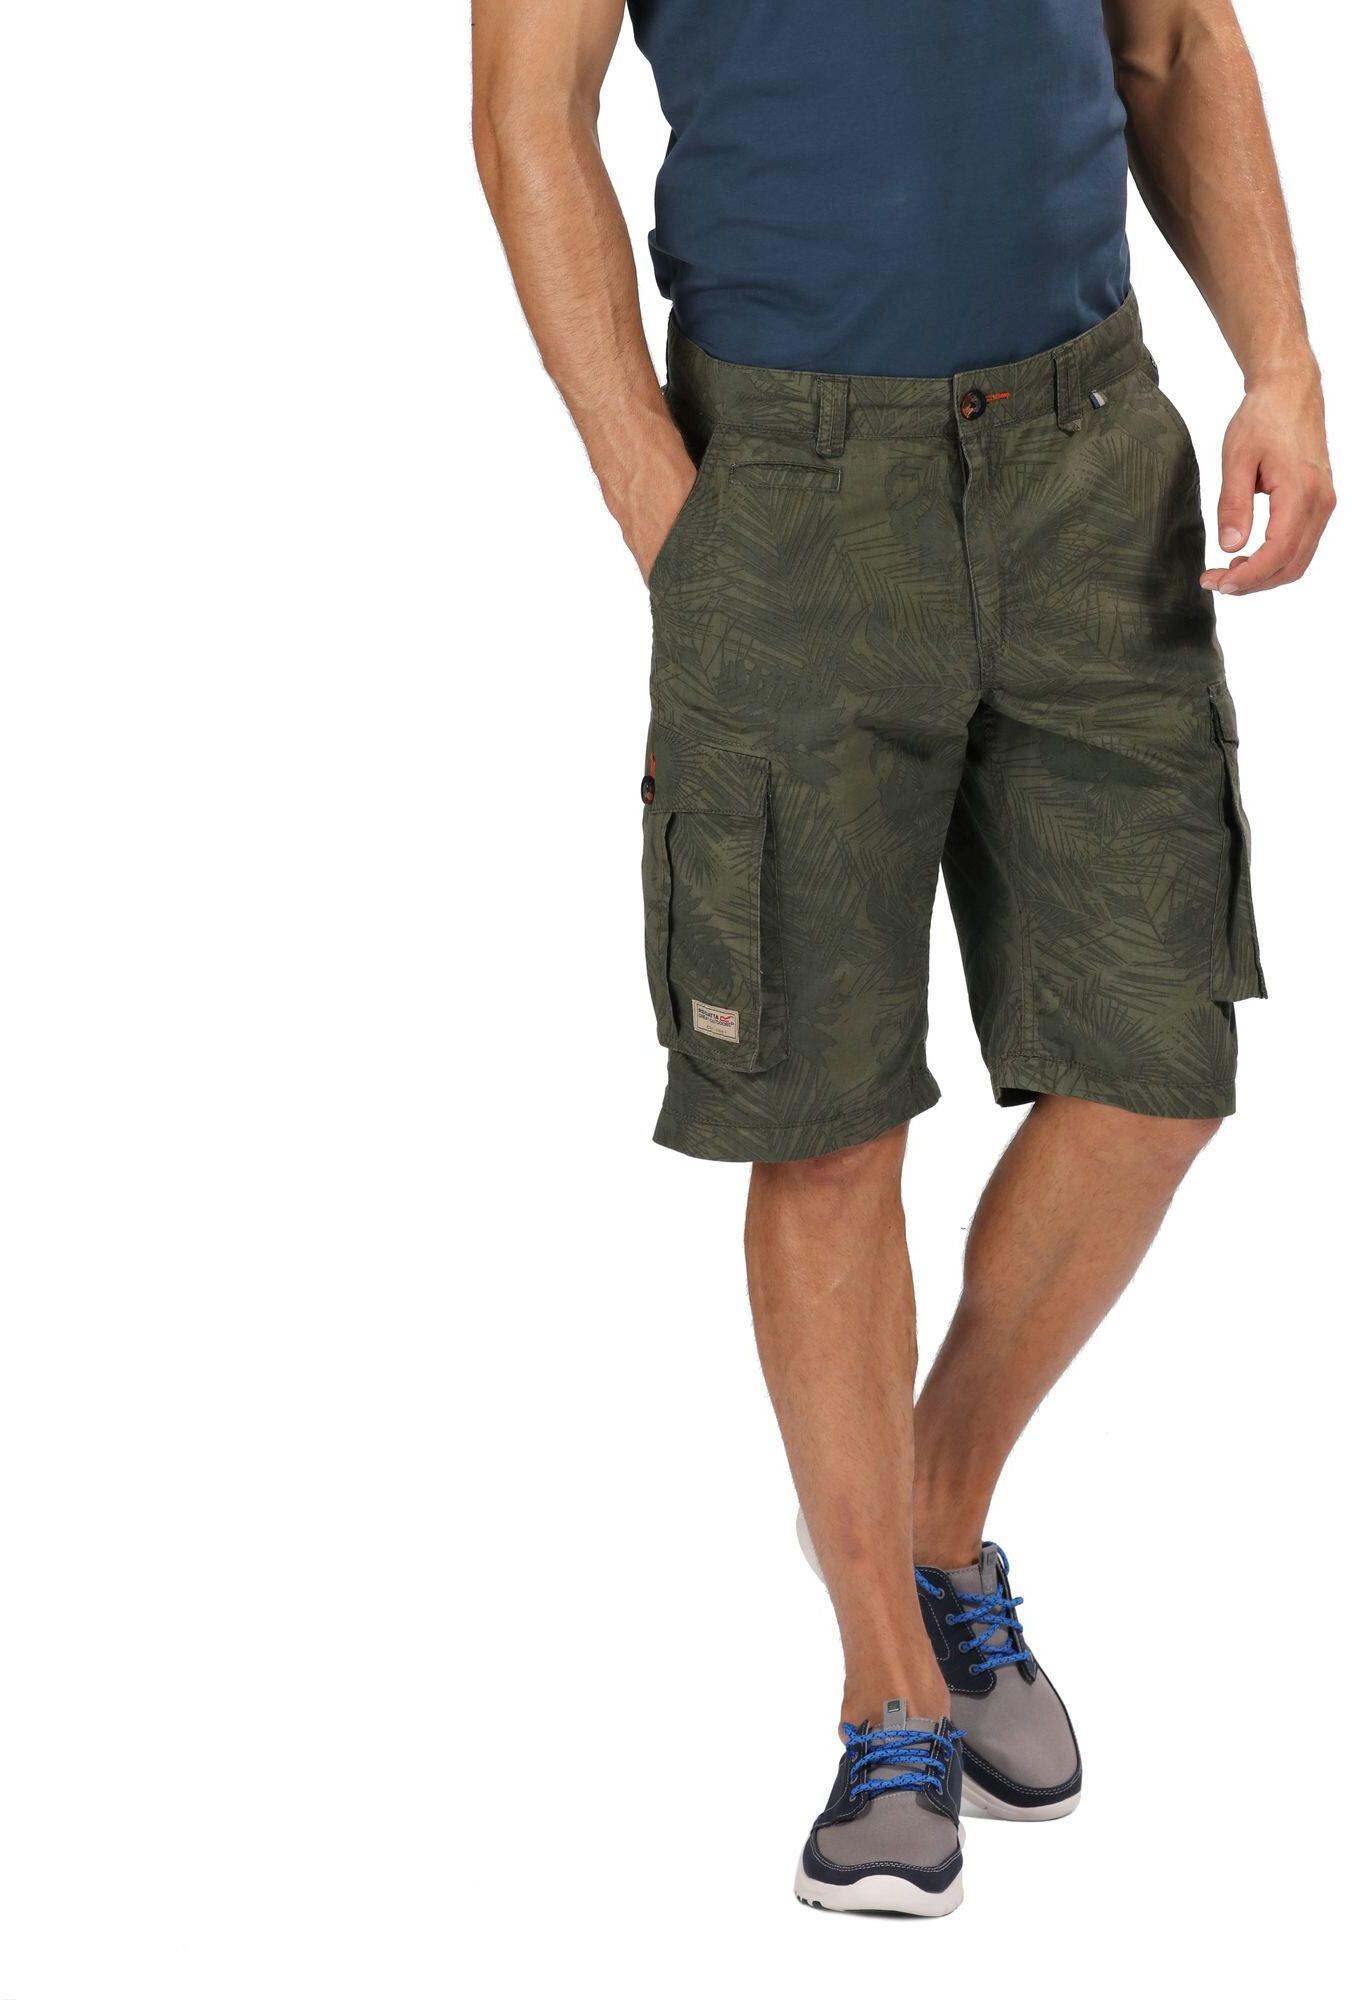 Fubotevic Men Summer Rugged Board Shorts Beach Swim Trunk Plain Cargo Shorts